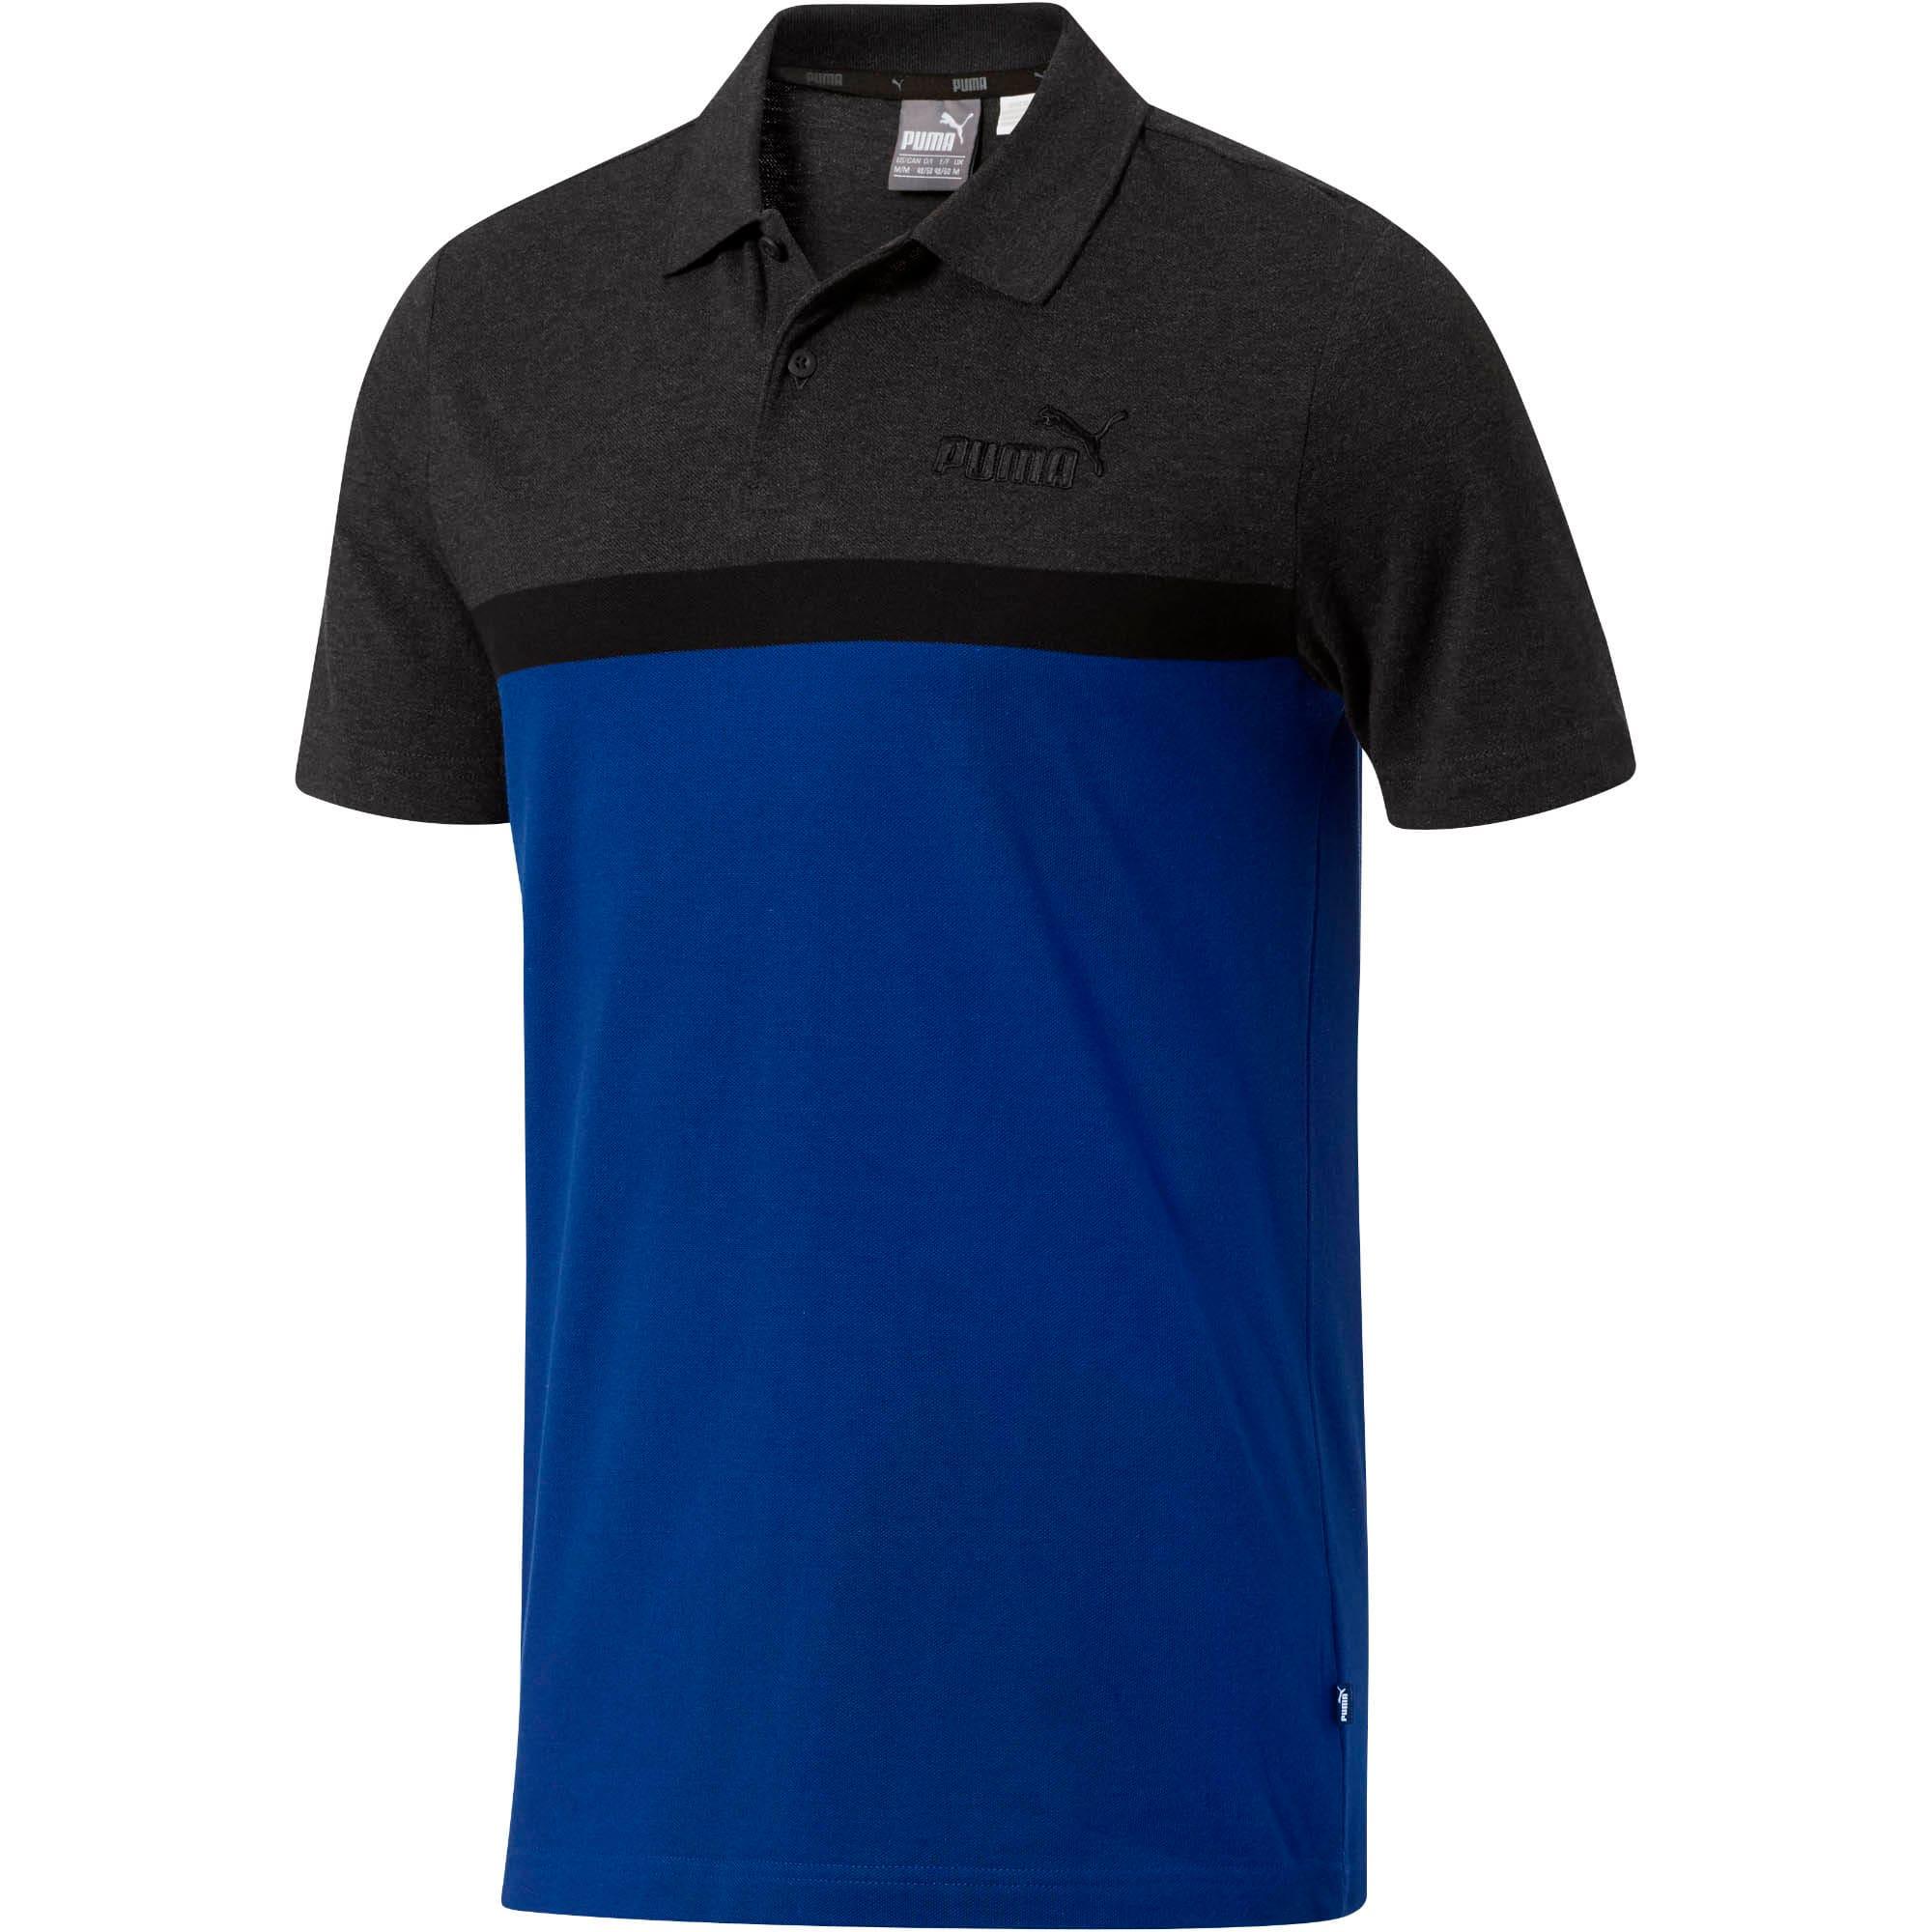 Thumbnail 1 of Essentials+ Stripe Men's Polo, Sodalite Blue, medium